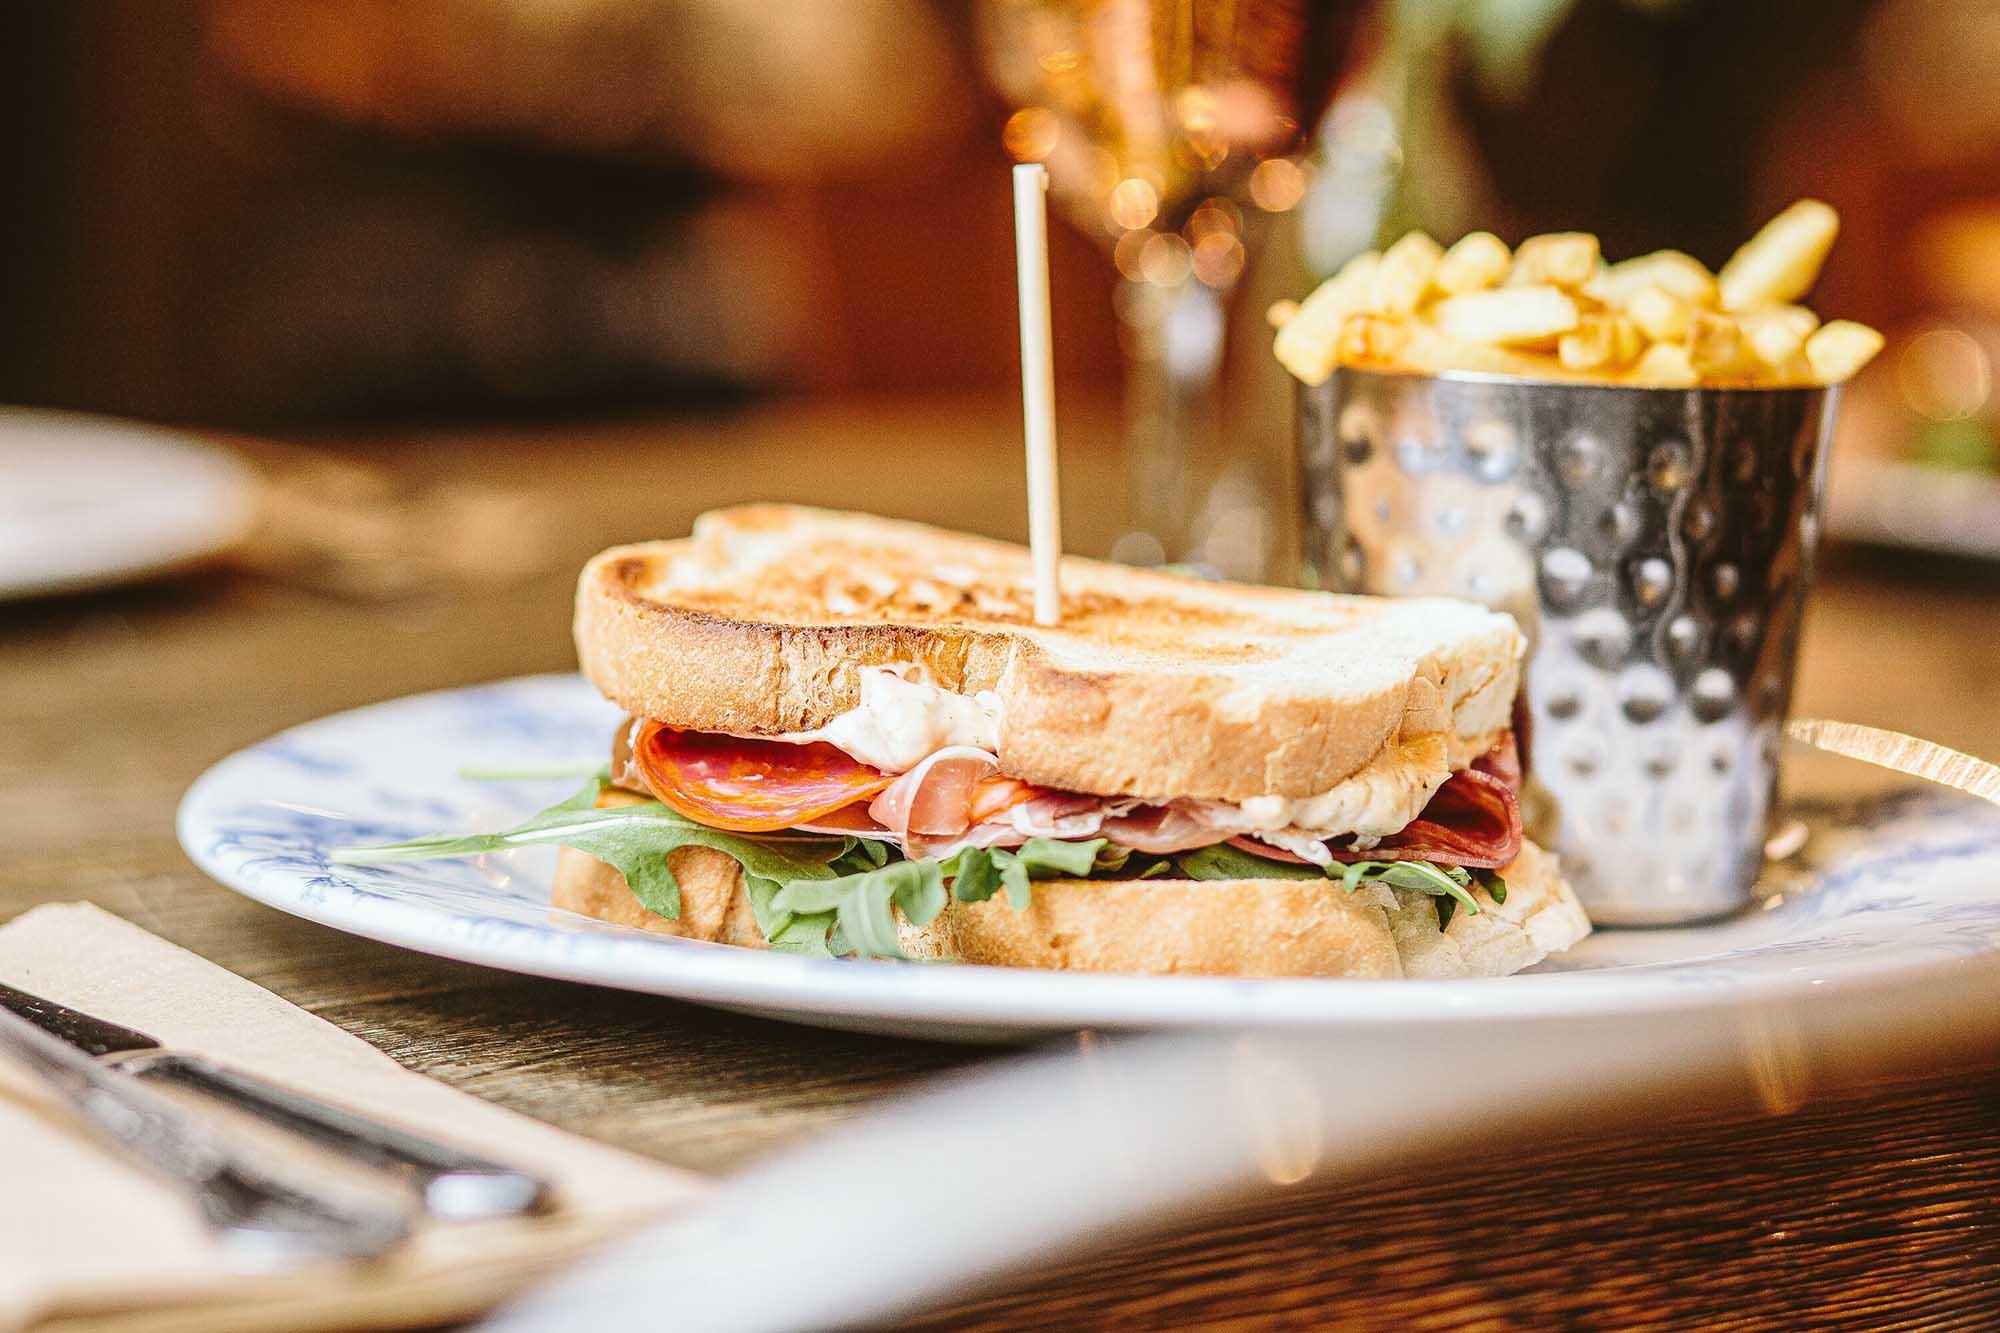 darcy's sandwich